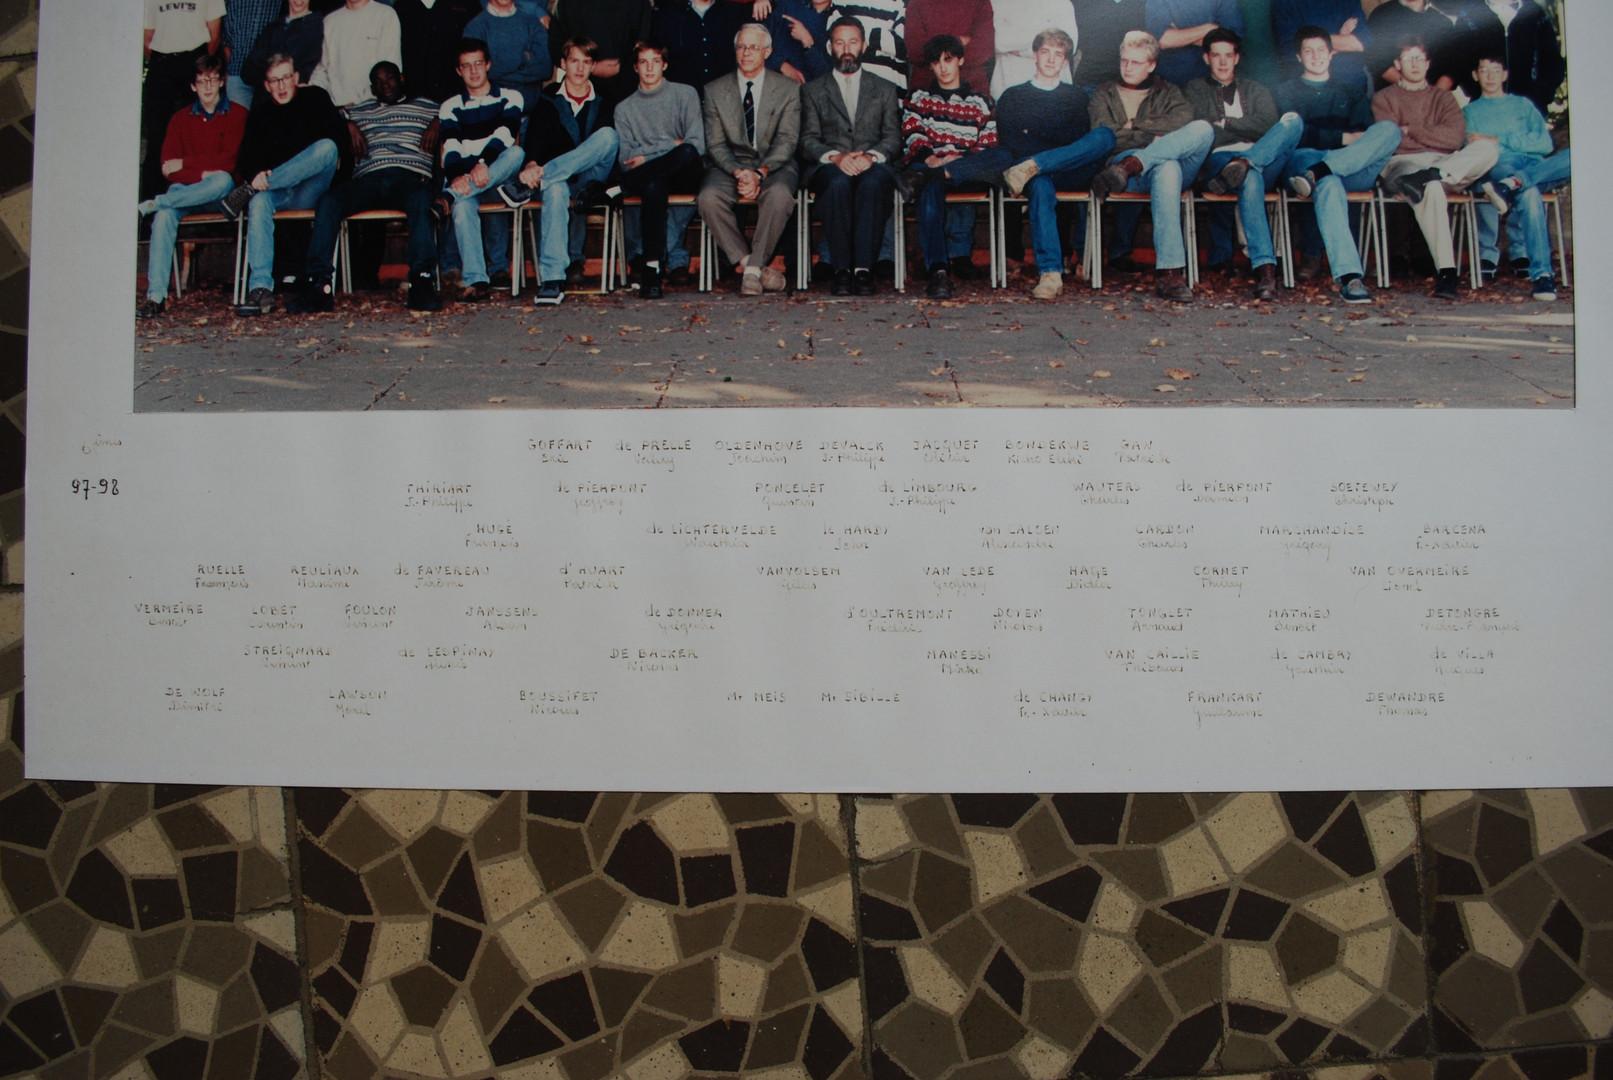 1997-1998-O'.JPG